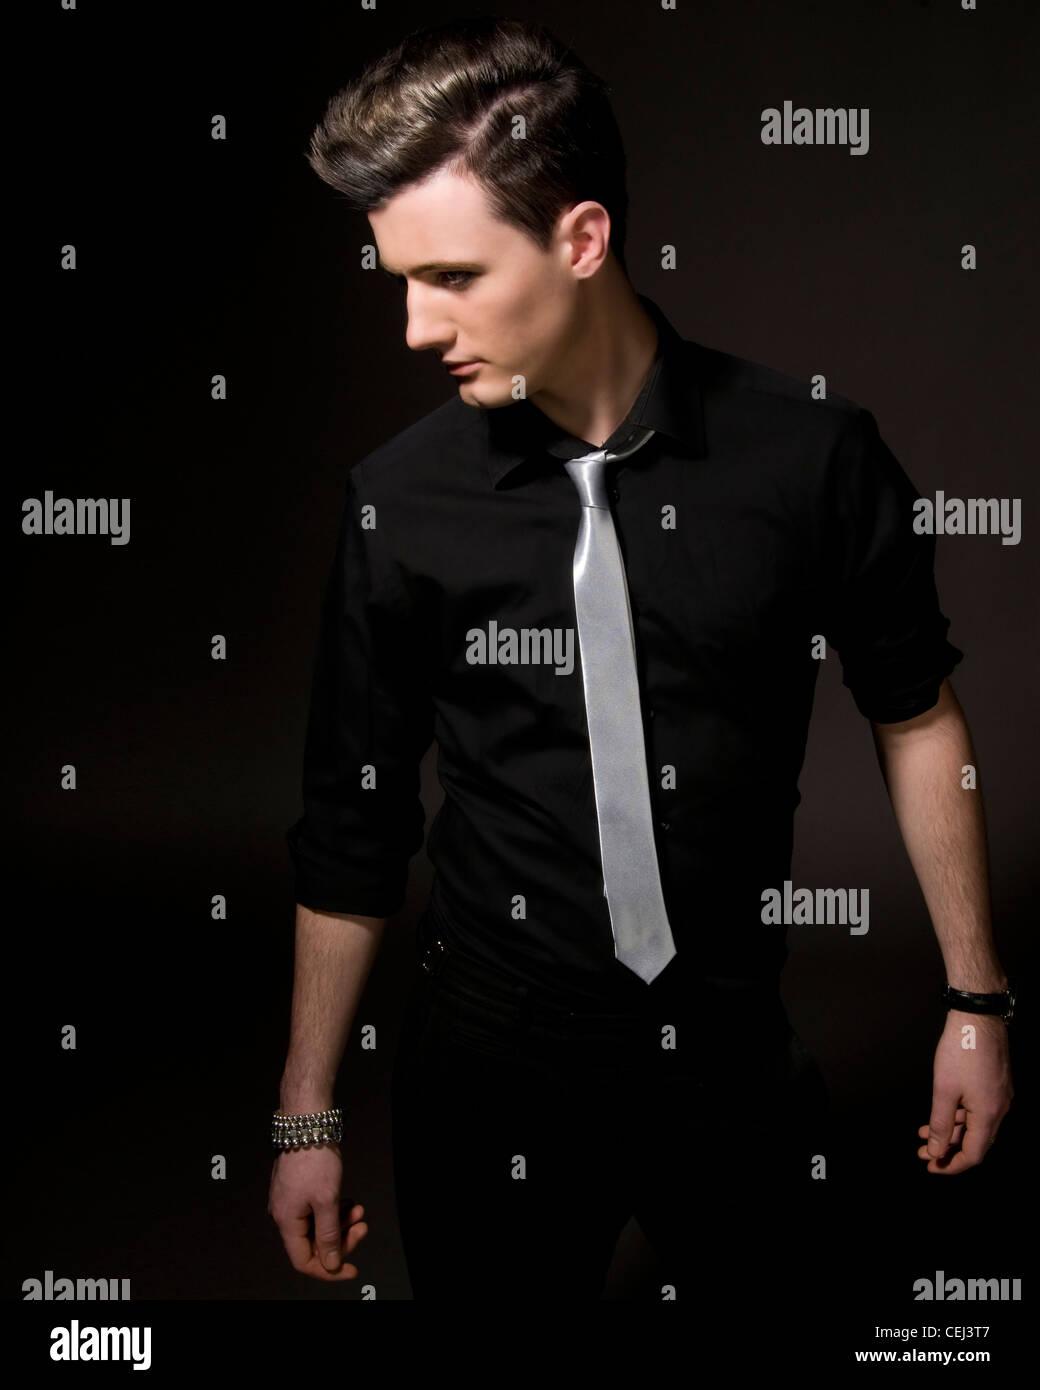 Male model in studio black shirt and silver tie stock for Black shirt black tie